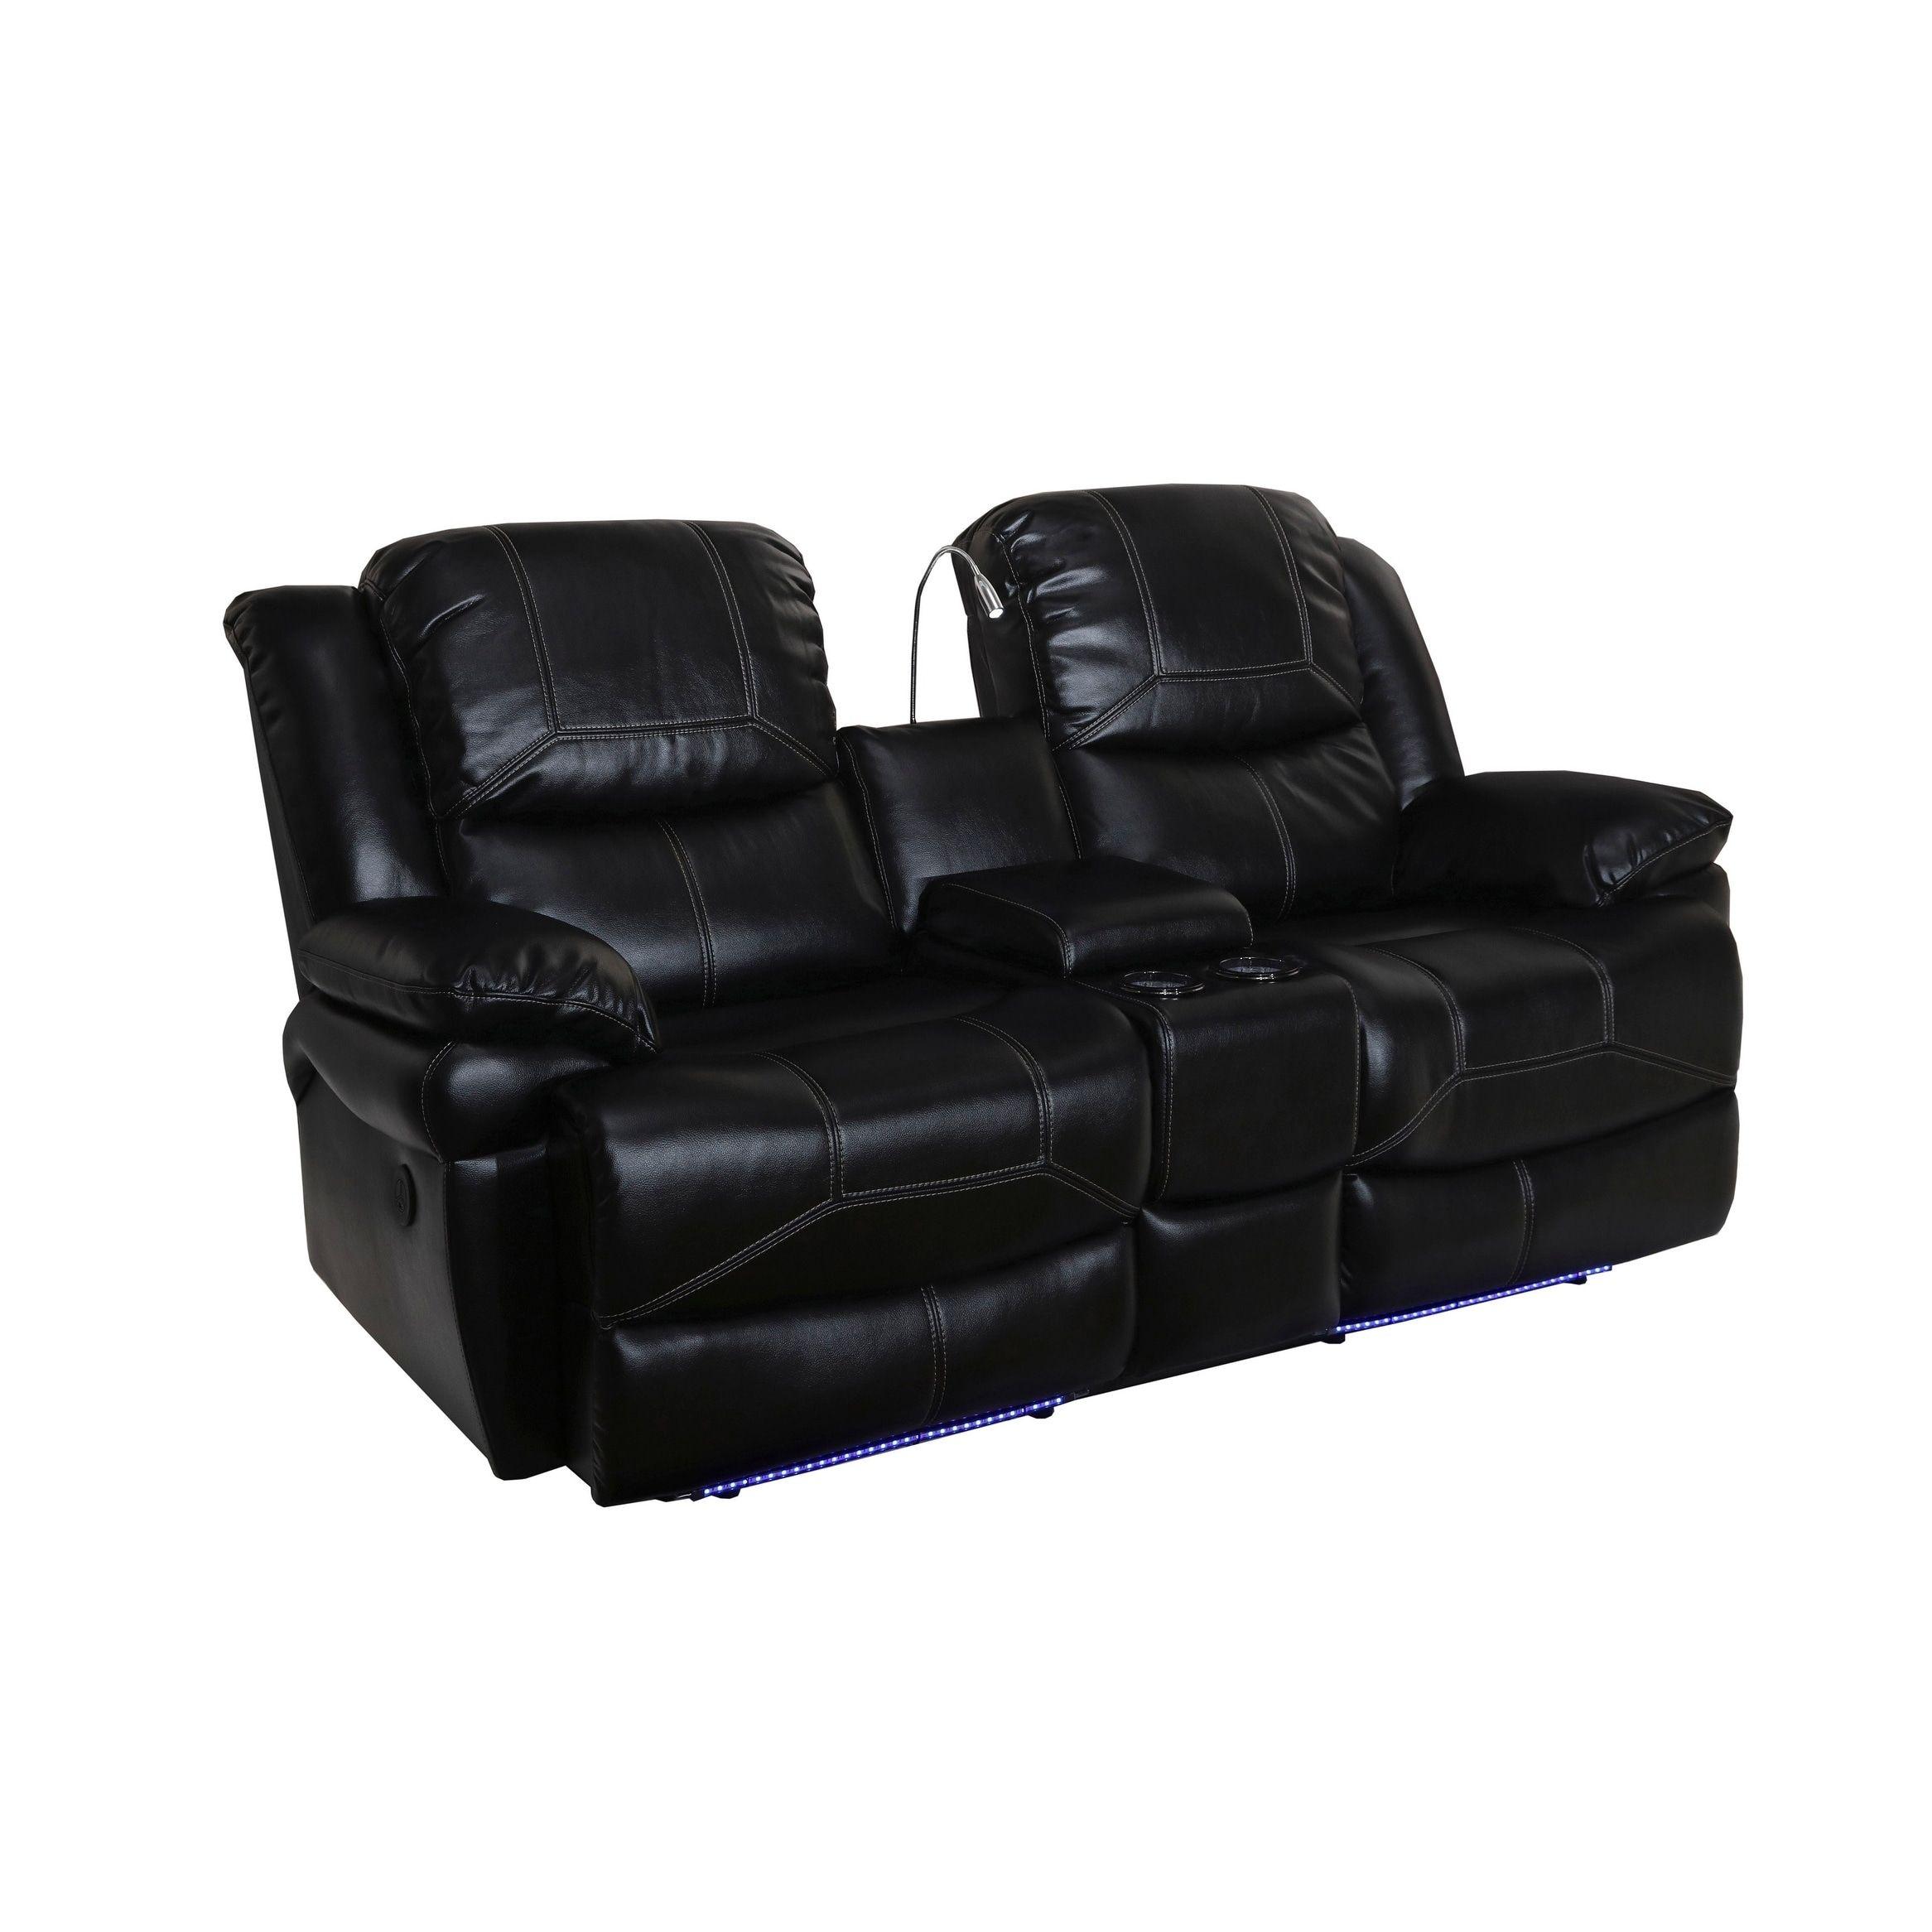 Magnificent Flynn Premier Black Power Motion Dual Recliner Console Creativecarmelina Interior Chair Design Creativecarmelinacom